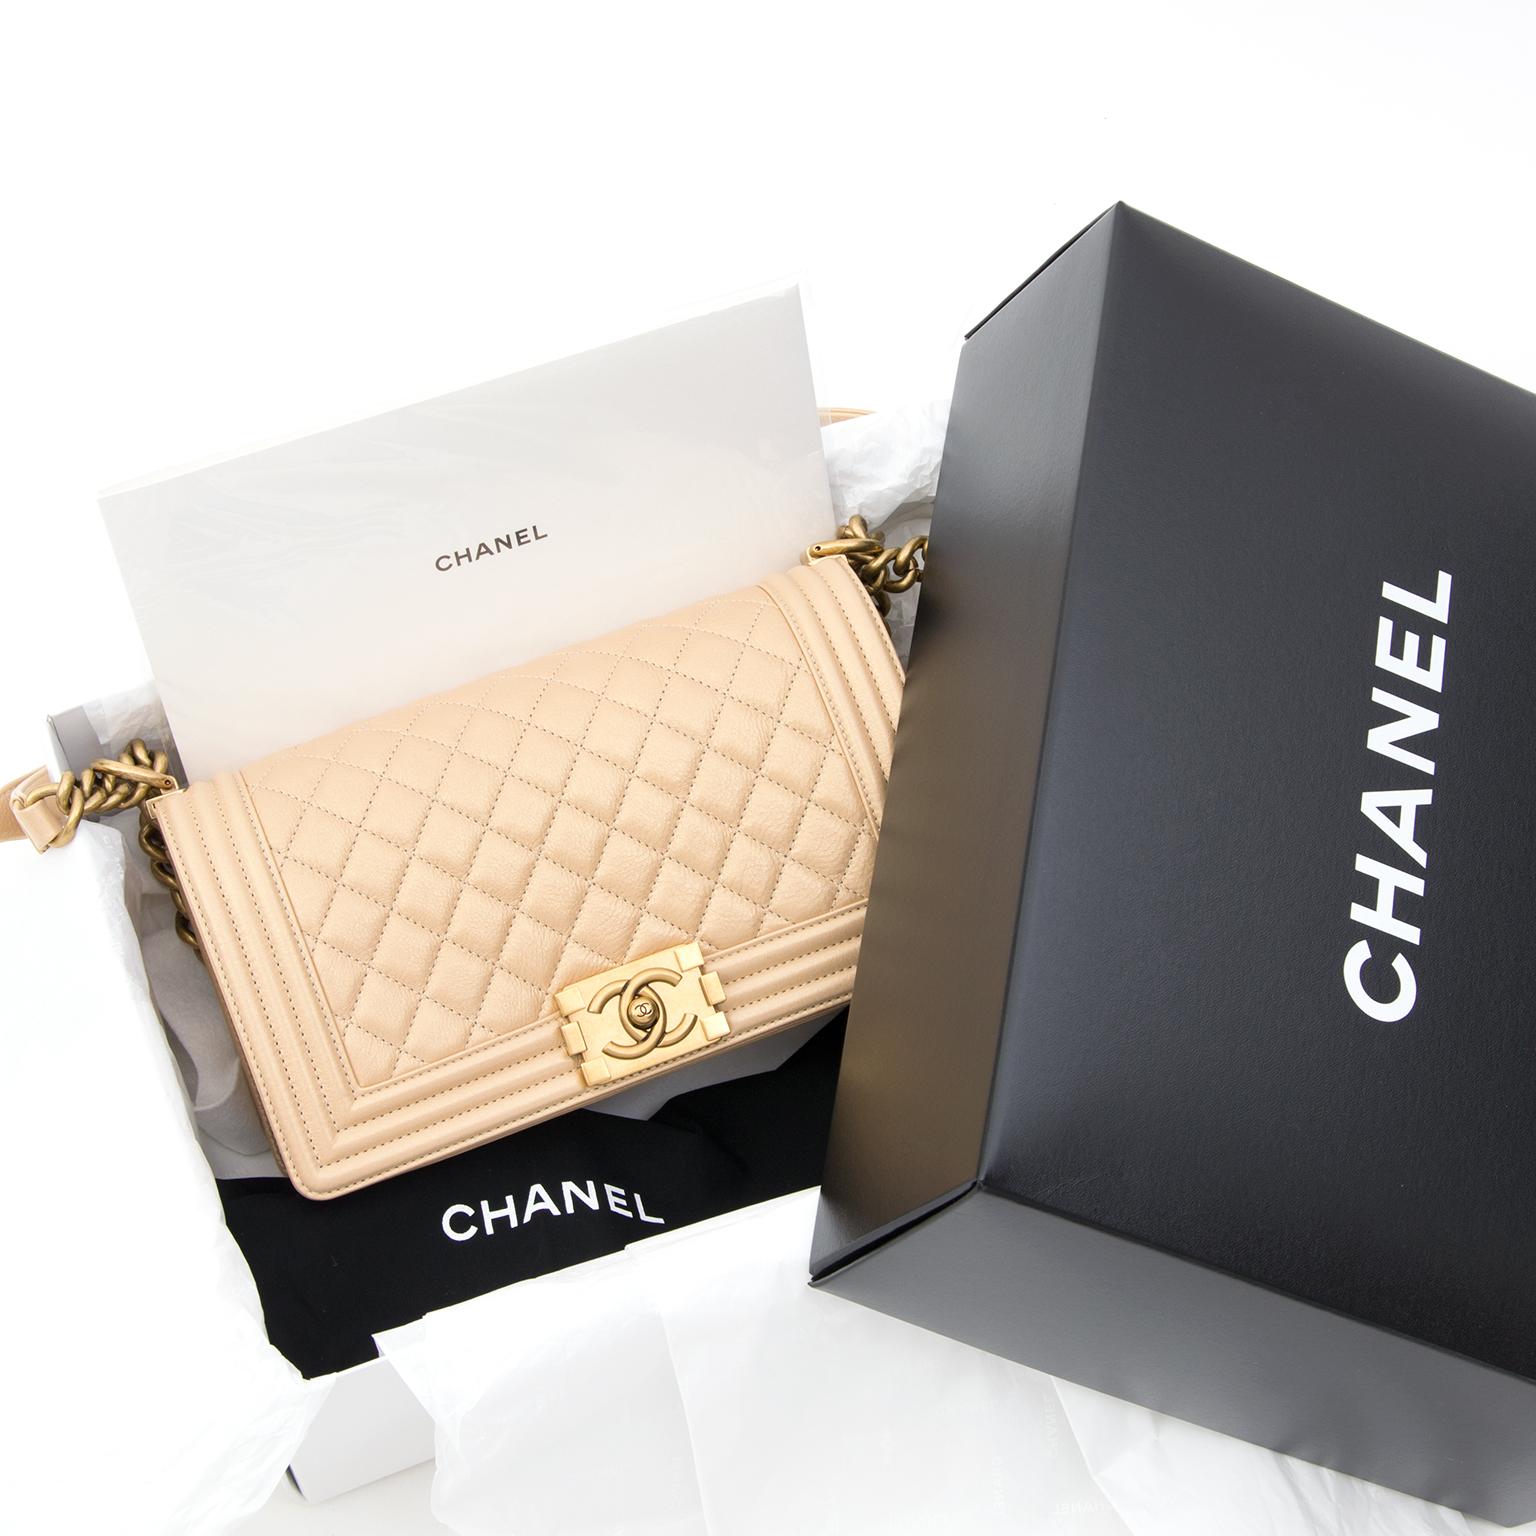 d9205dd04be2 ... instant luxe sac a main Chanel Boy comme neuf, 100% authentic site en  ligne